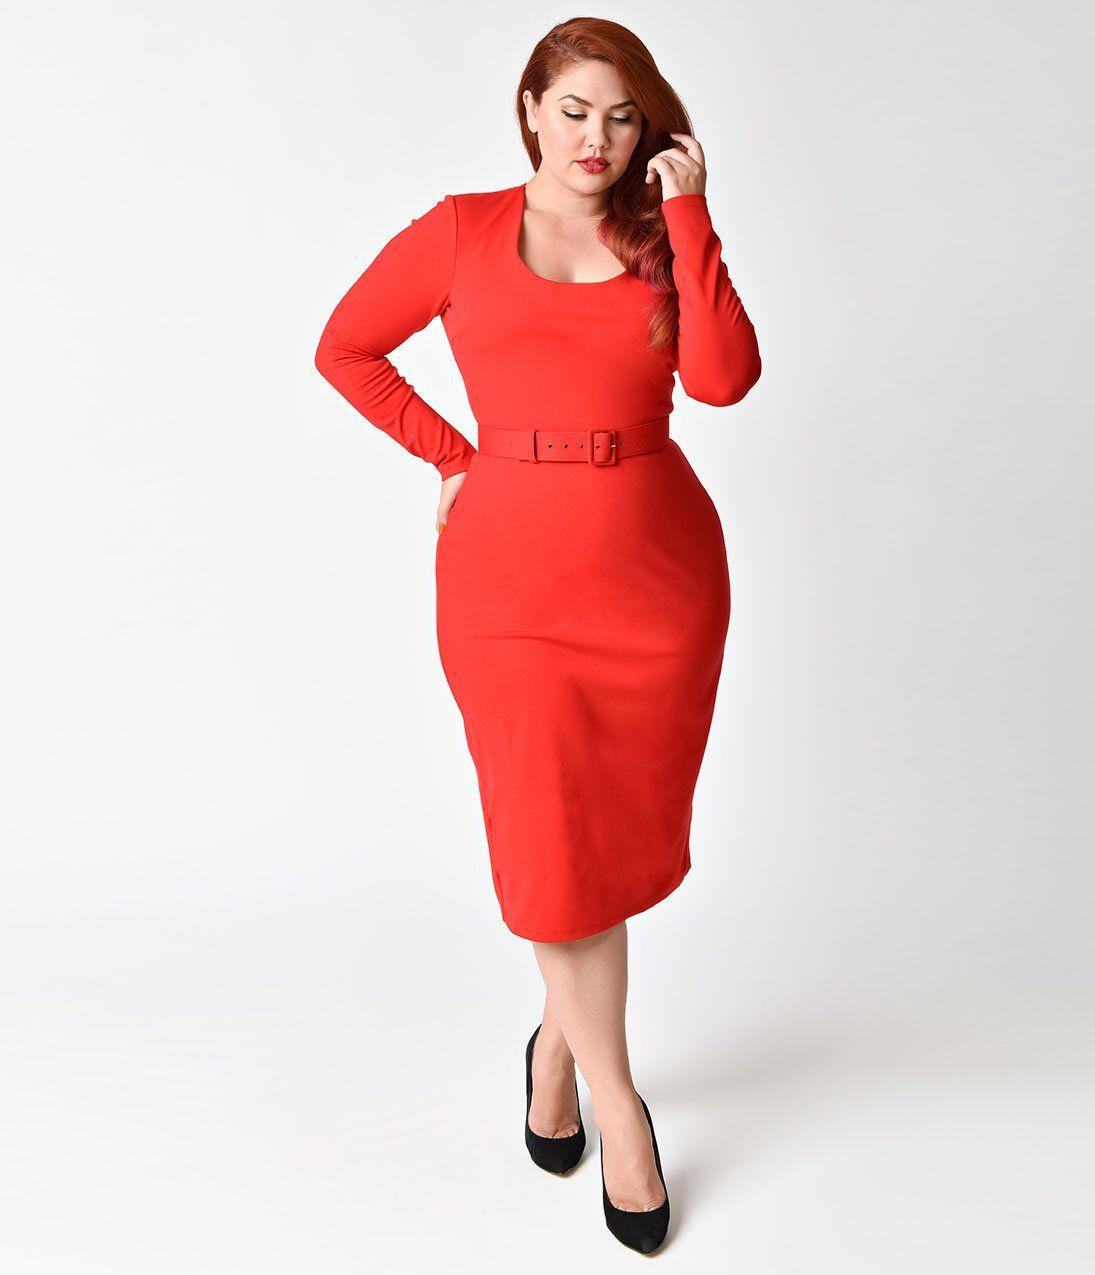 Vixen by Micheline Pitt Plus Size Vintage Red Long Sleeve